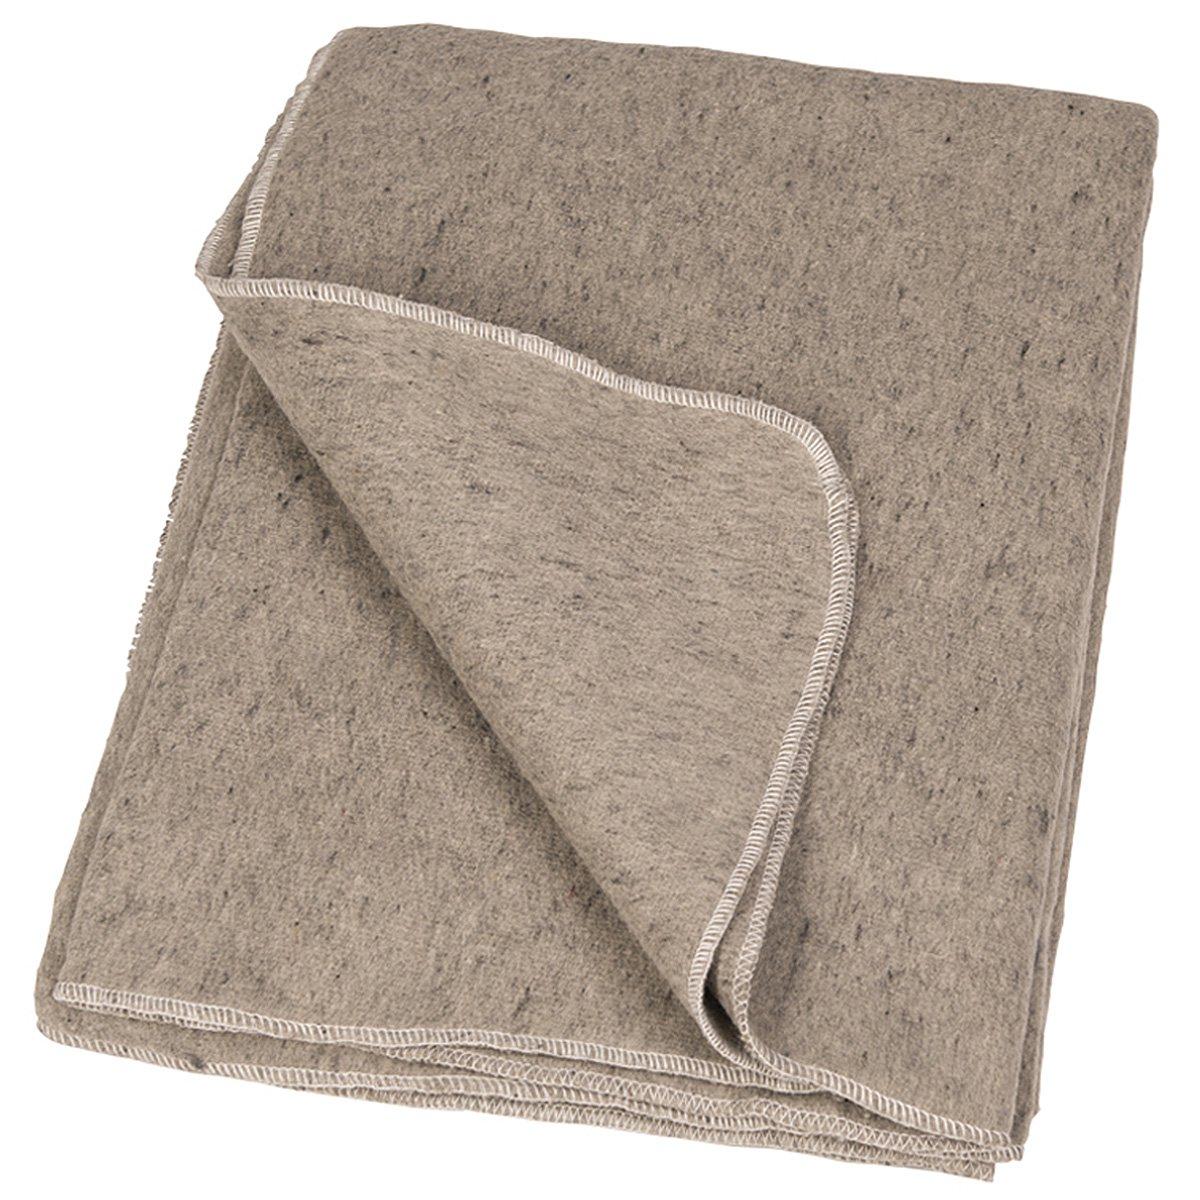 wolldecke katastrophenschutz grau neuwertig 16 90 o. Black Bedroom Furniture Sets. Home Design Ideas